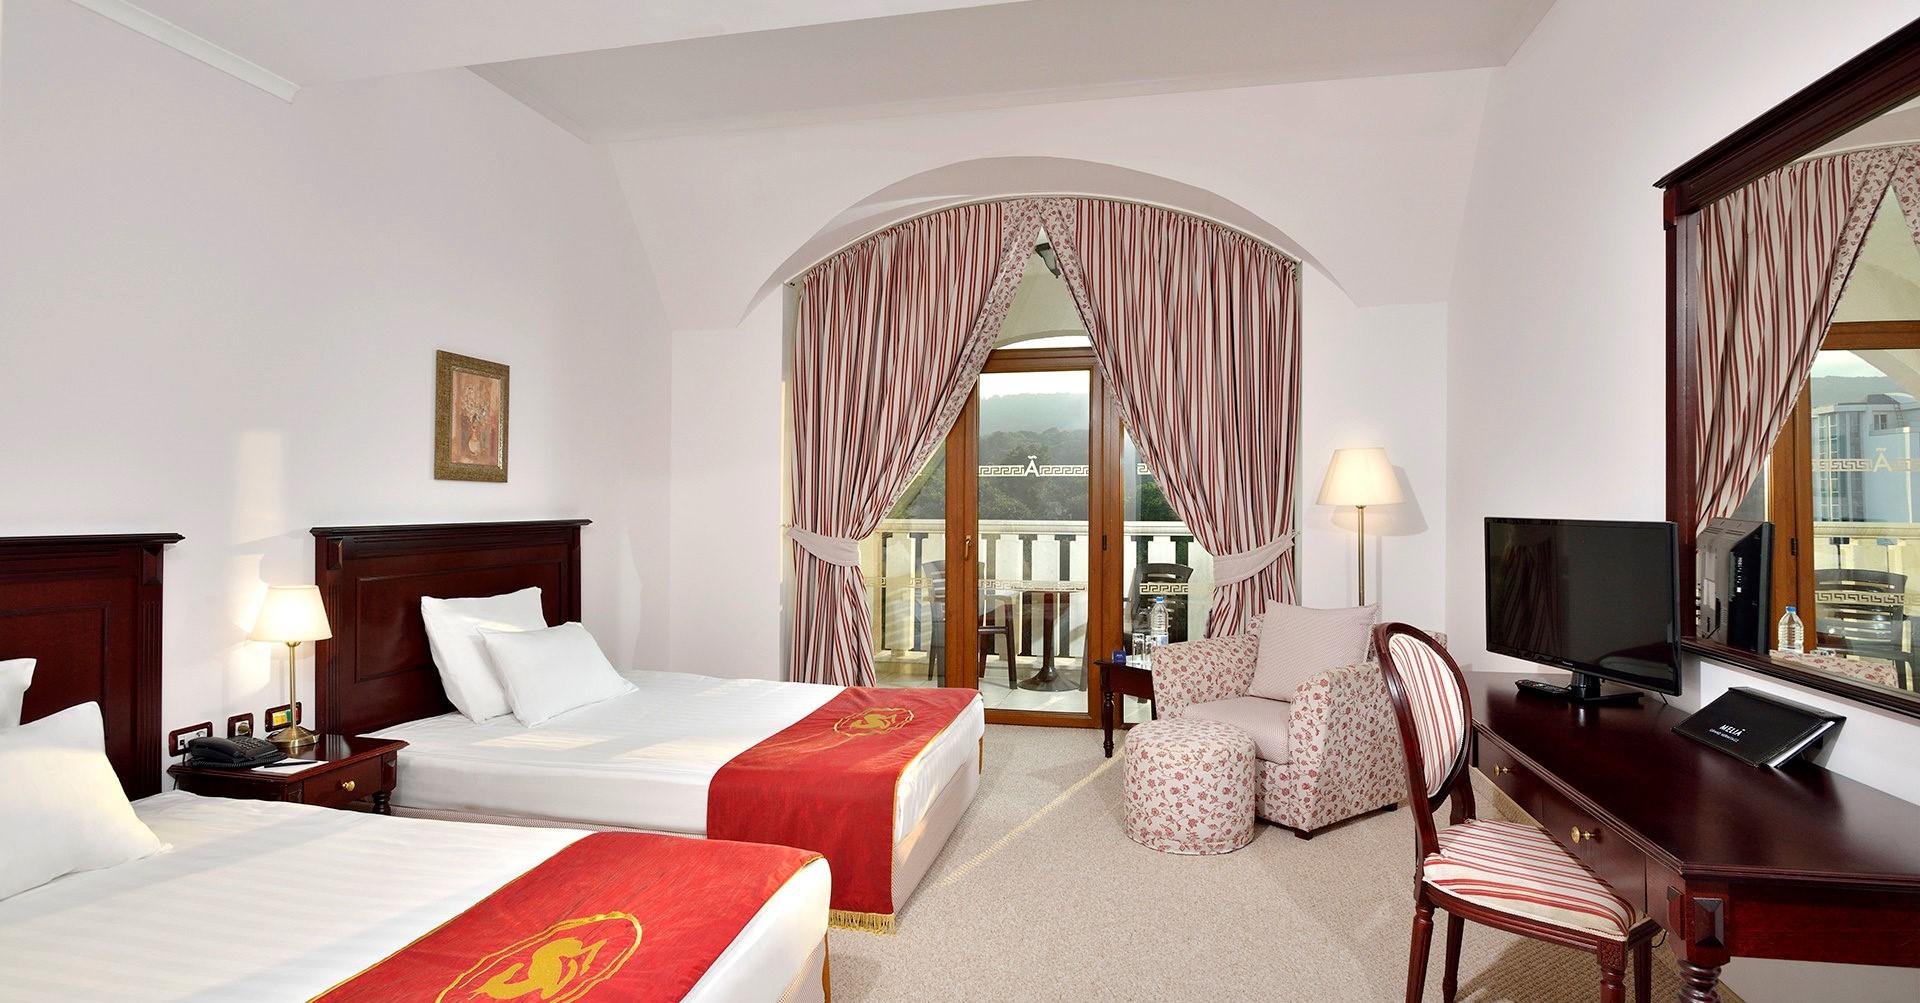 Hotel Melia Grand Hermitage #2